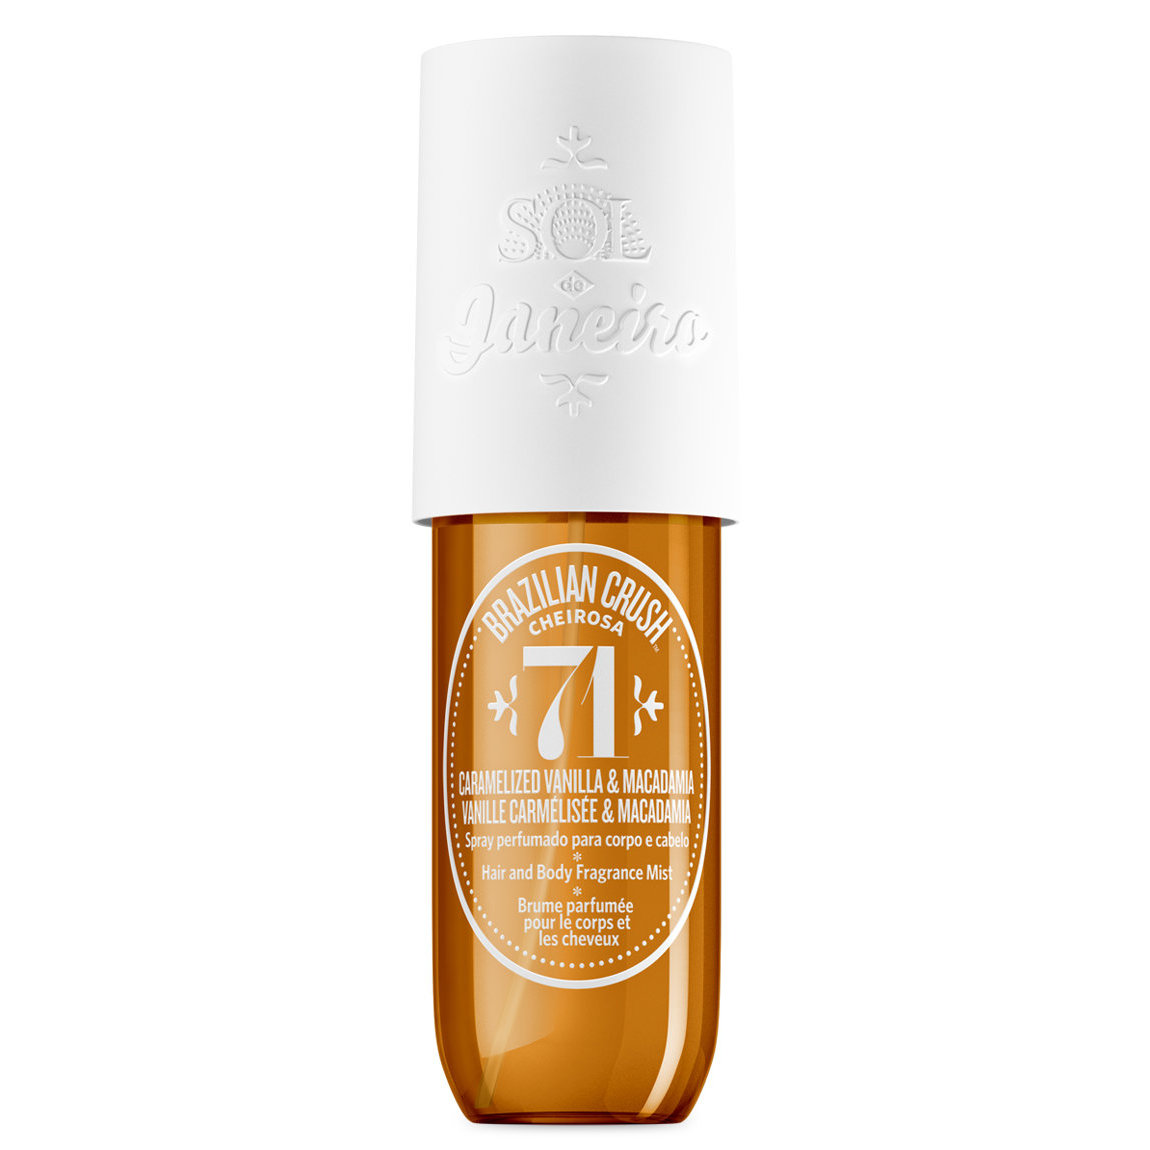 Sol de Janeiro Cheirosa '71 Hair & Body Fragrance Mist alternative view 1 - product swatch.